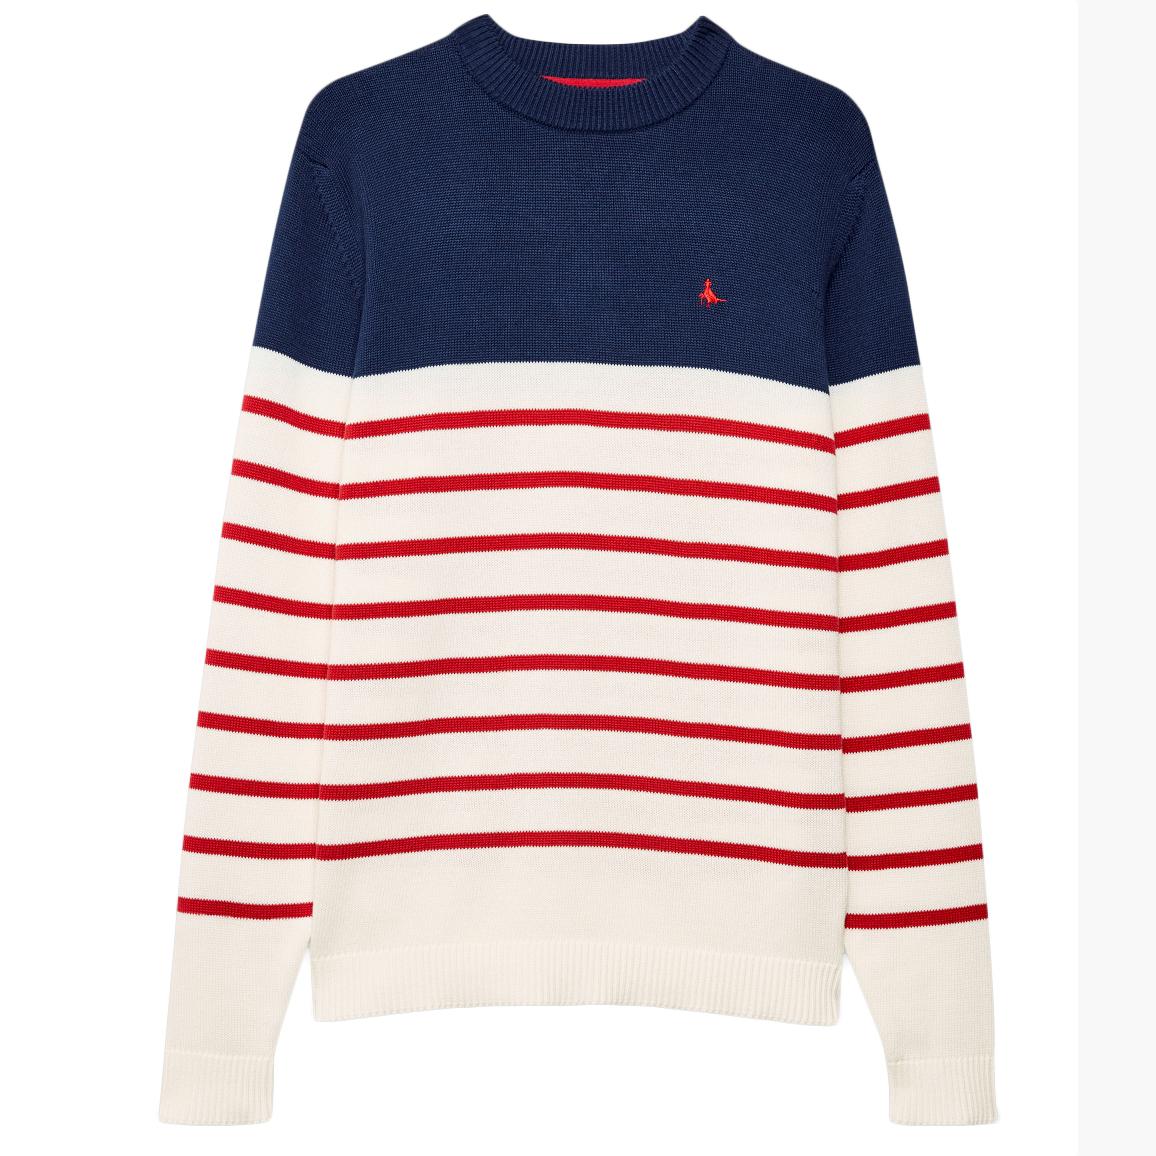 Jack Wills Men's Elwick Knitted Stripe Sweater - Black, S